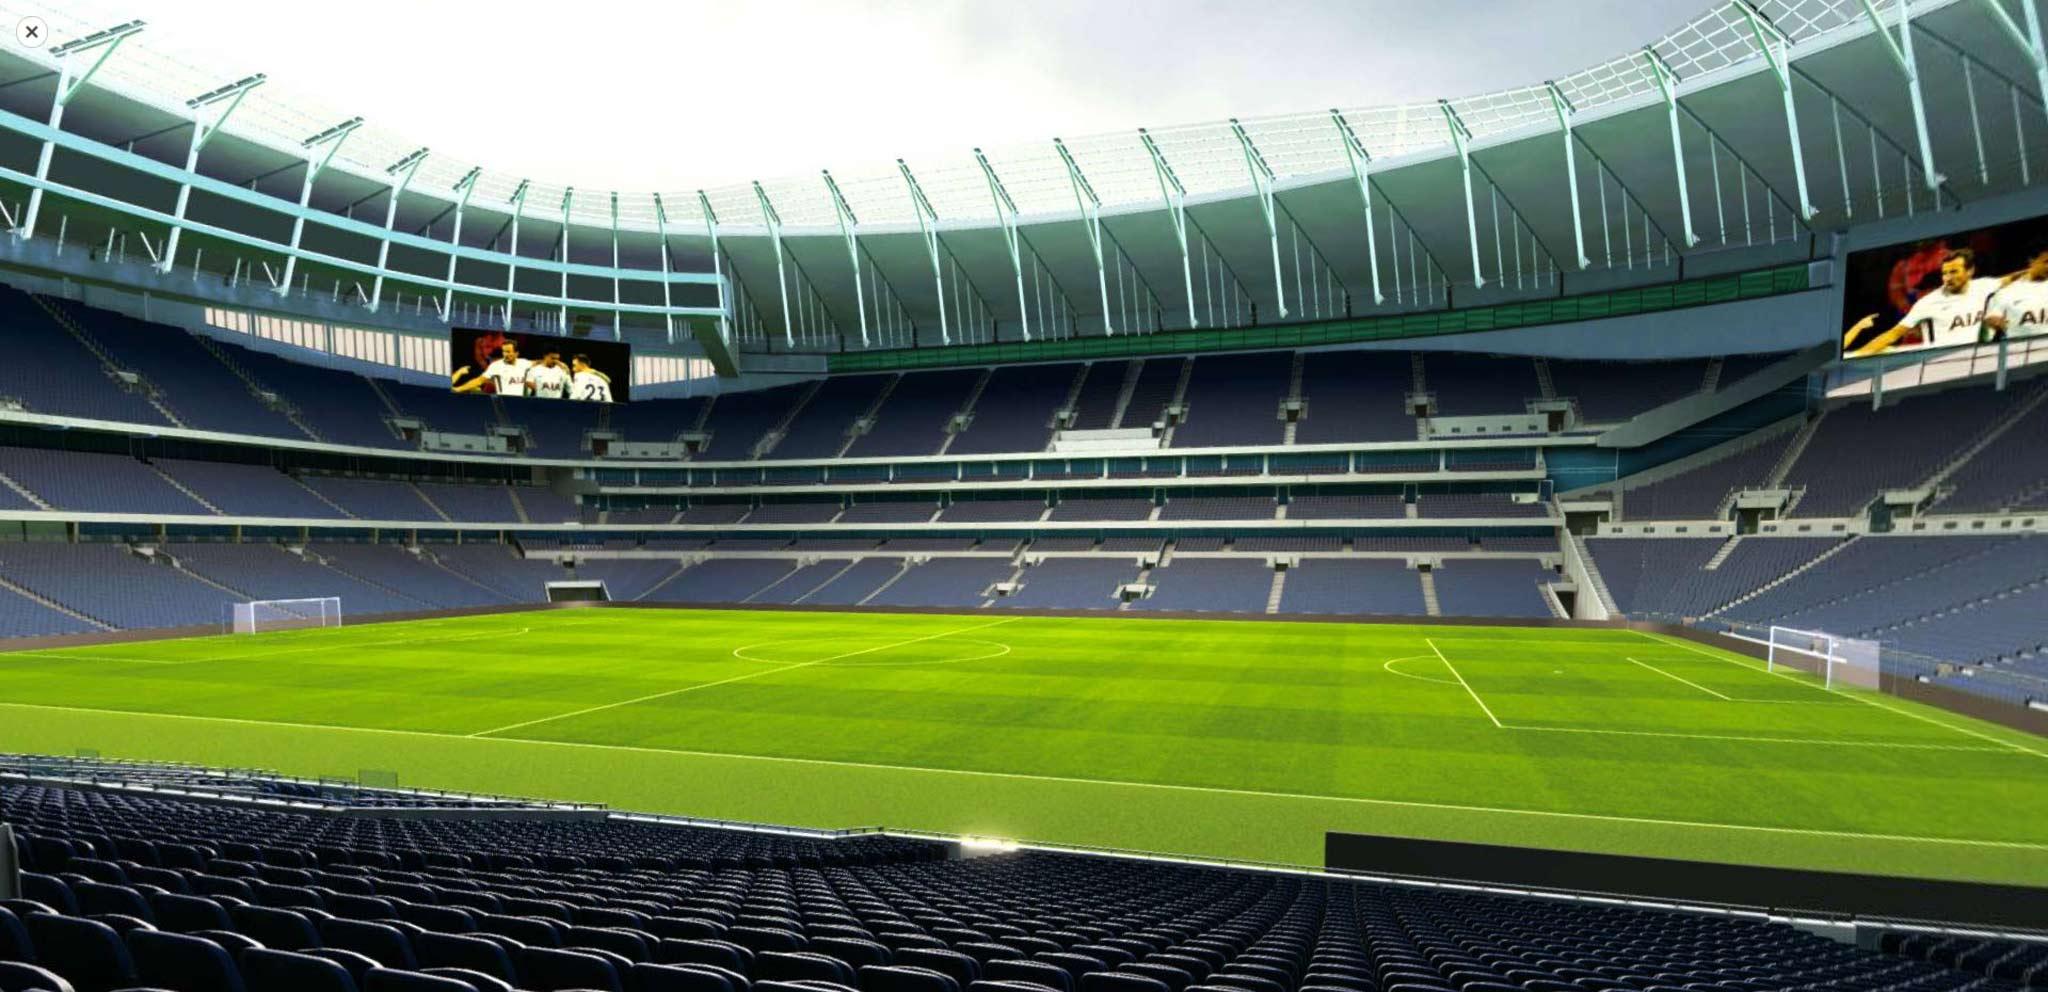 Stadiony Tottenhema i Reala otdany dlya borby s koronavirusom